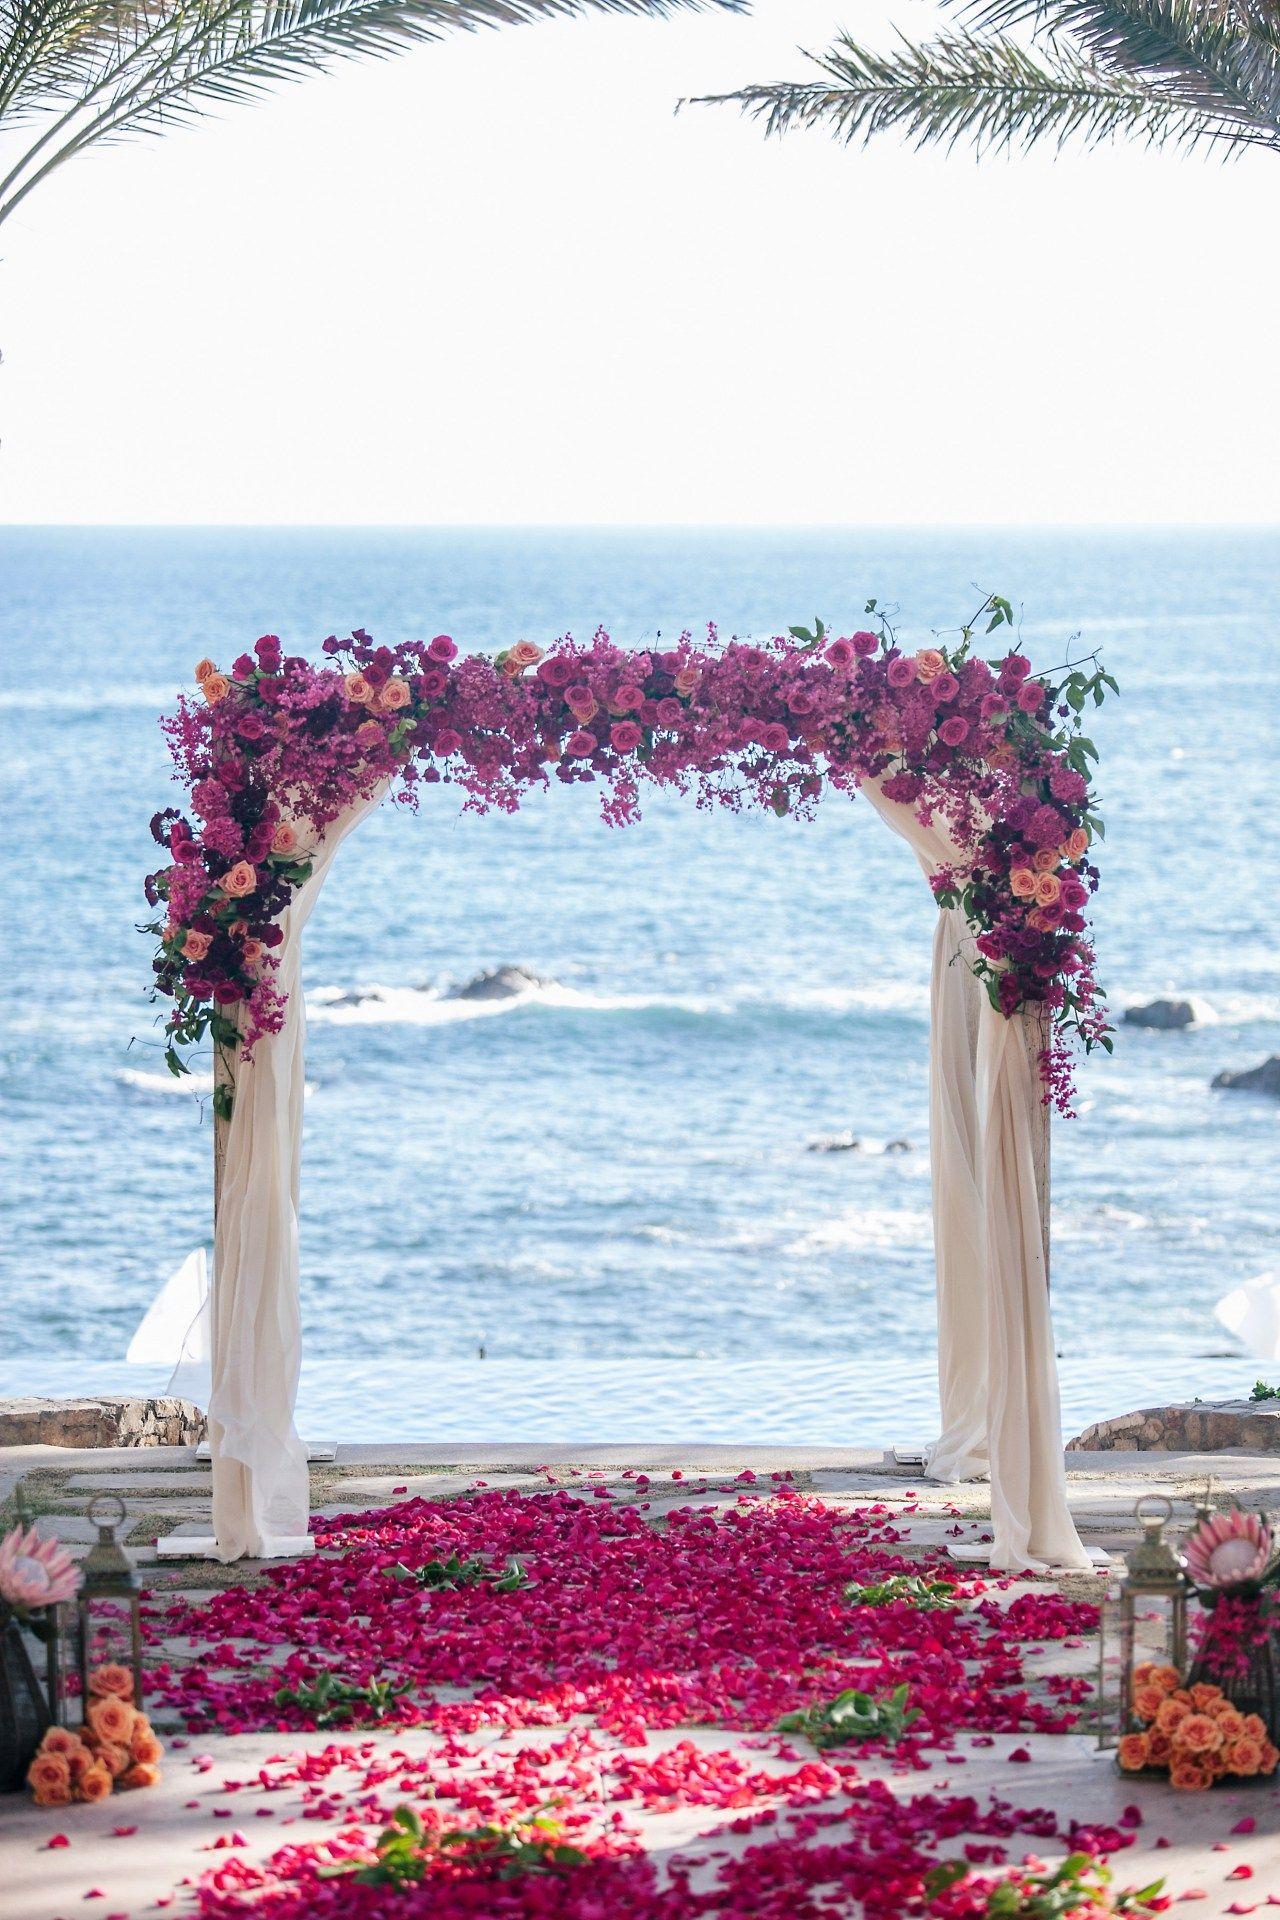 Beach wedding arches 1 wedding arch beach wedding